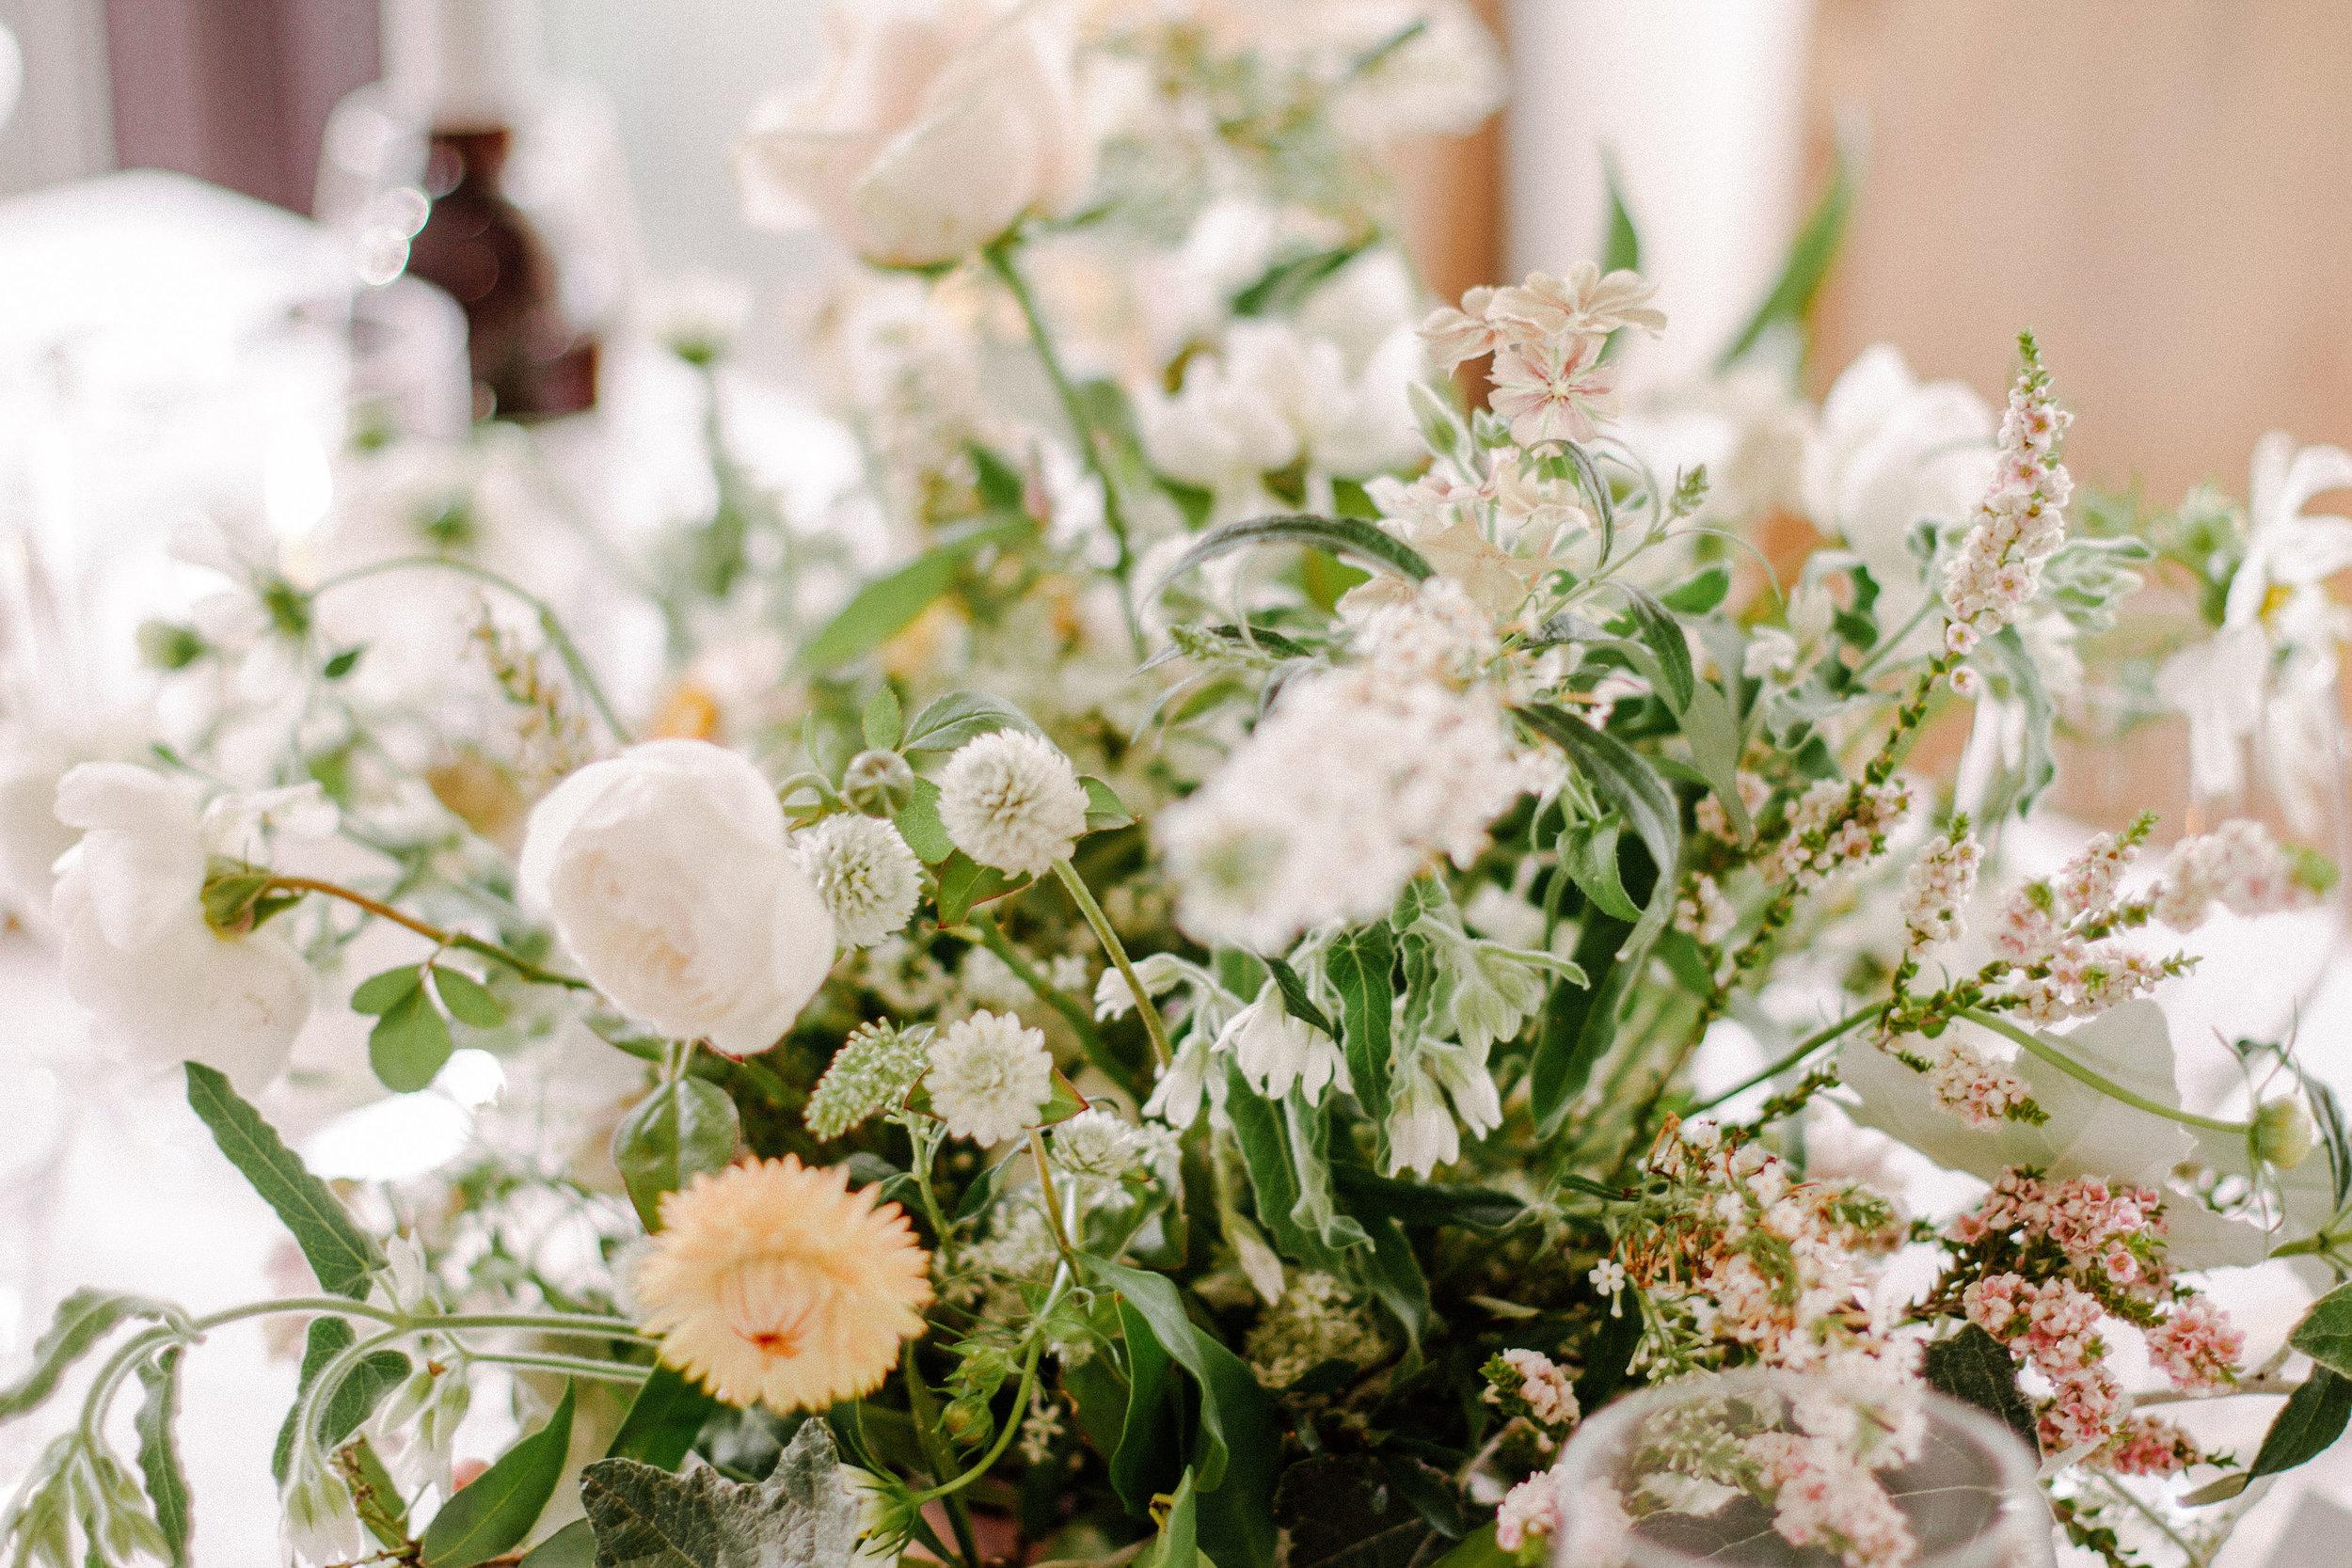 sydney beach wedding. textural and romantic wedding flowers. native australian bridal bouquets